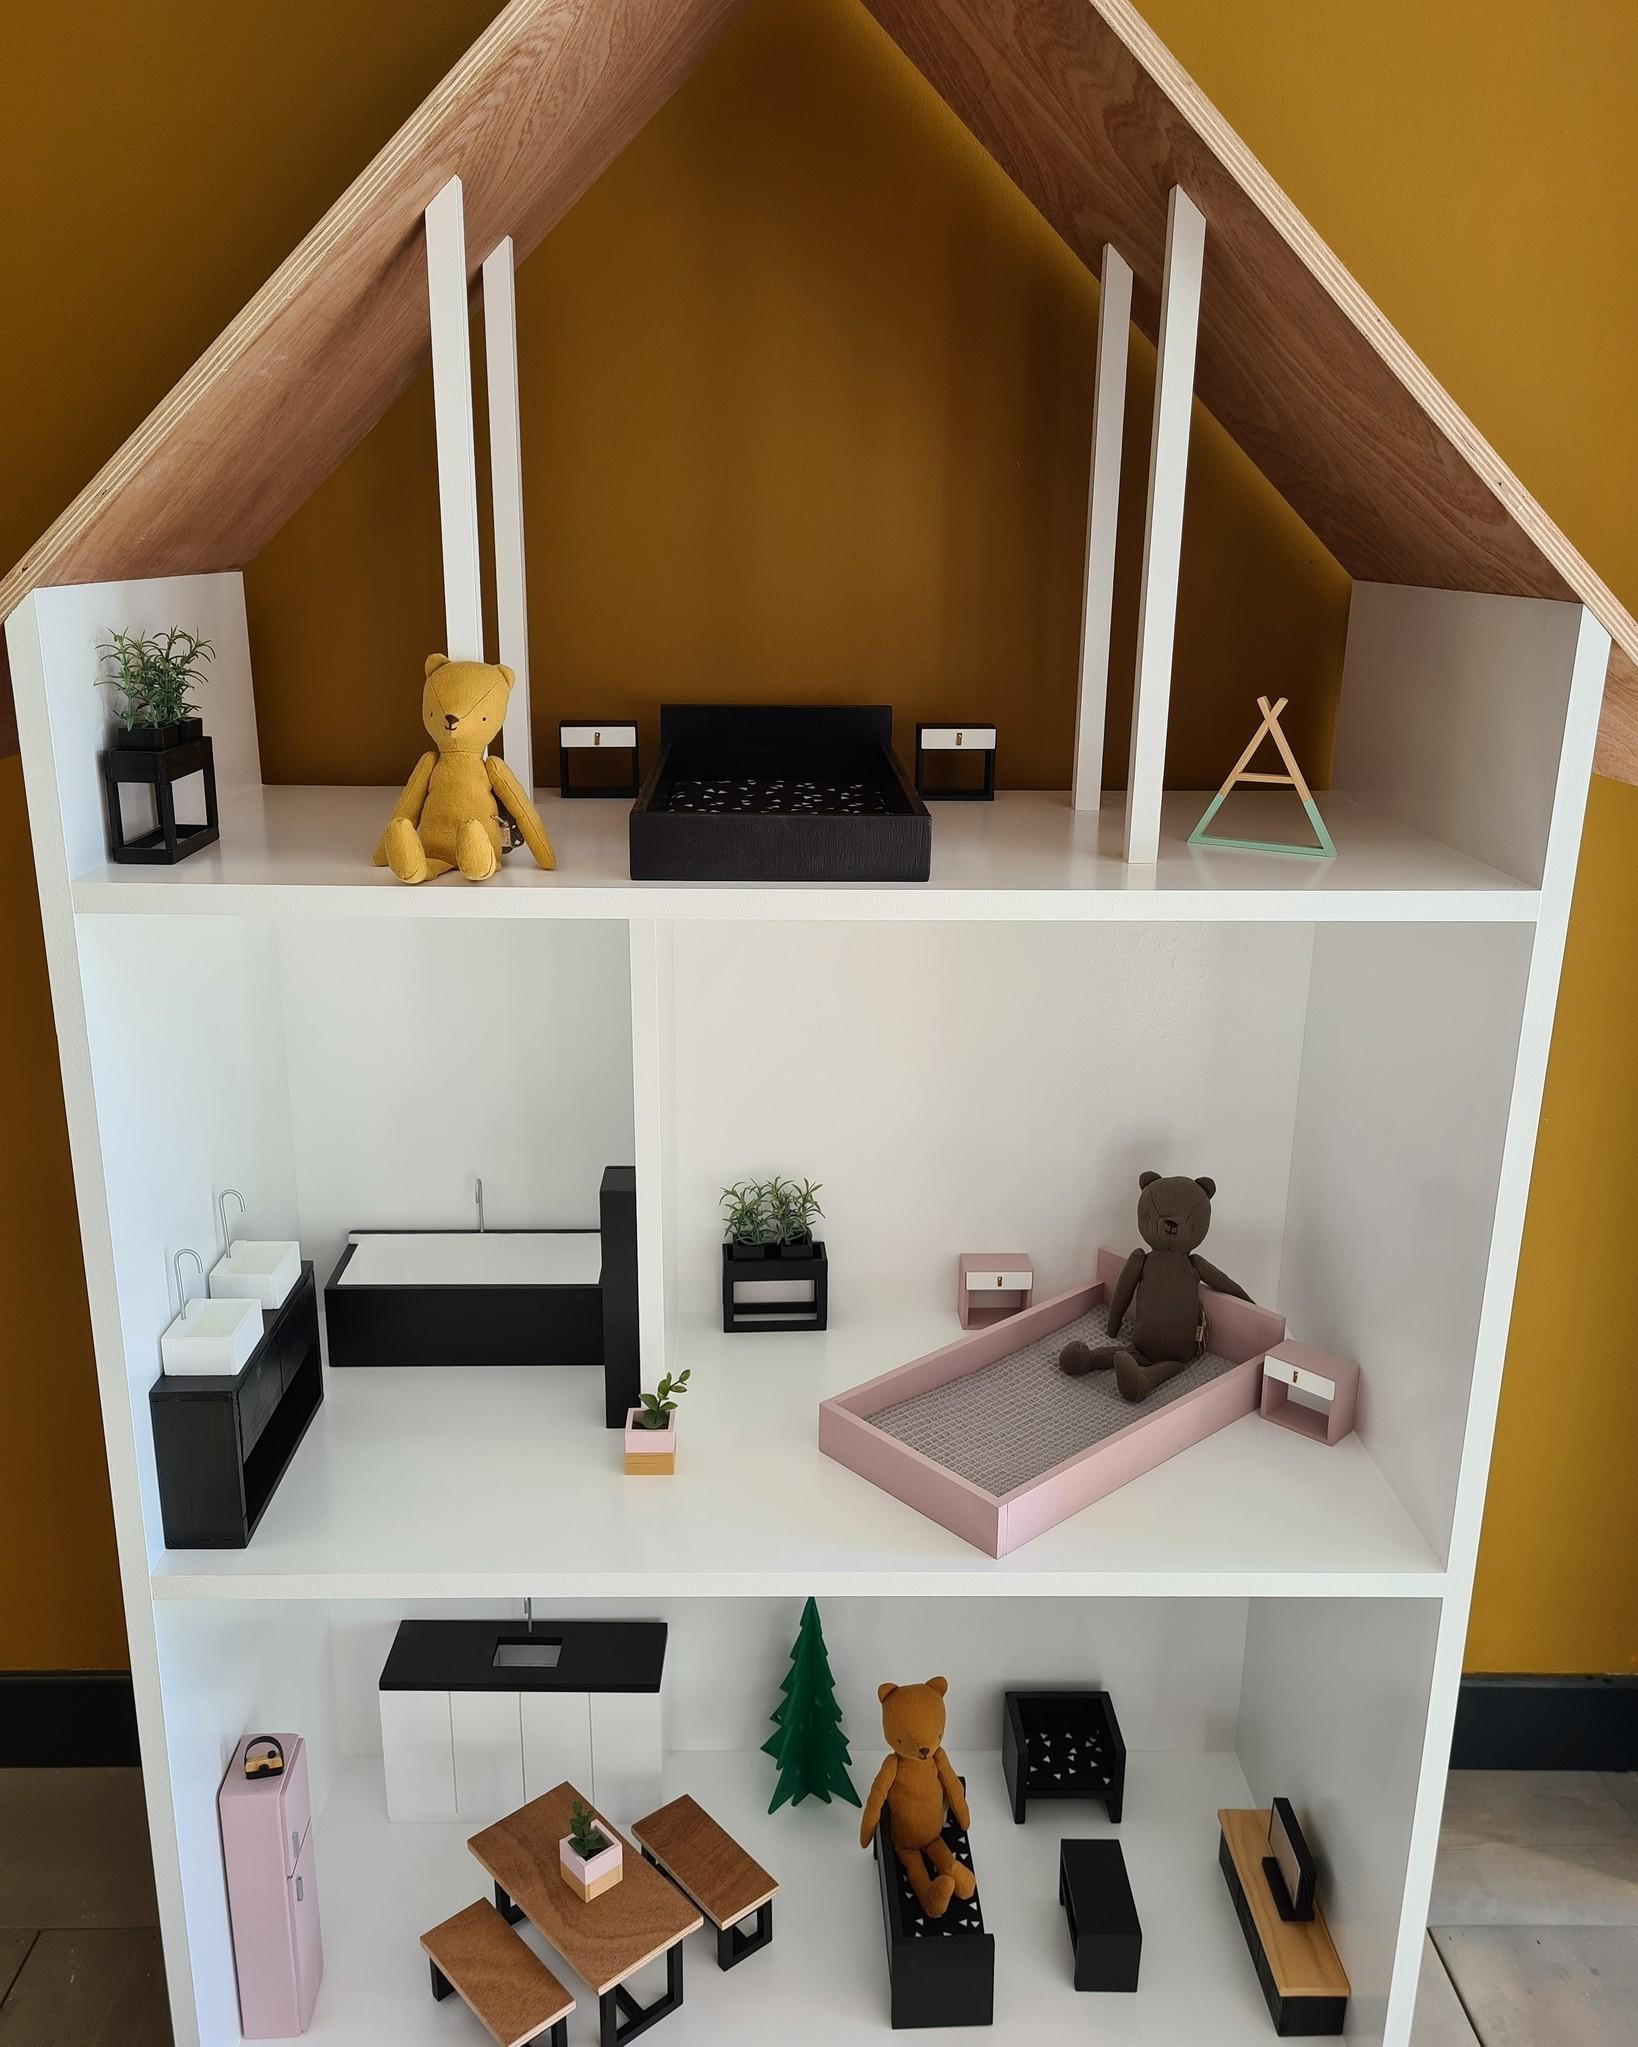 Minthe Barbiehuis 1